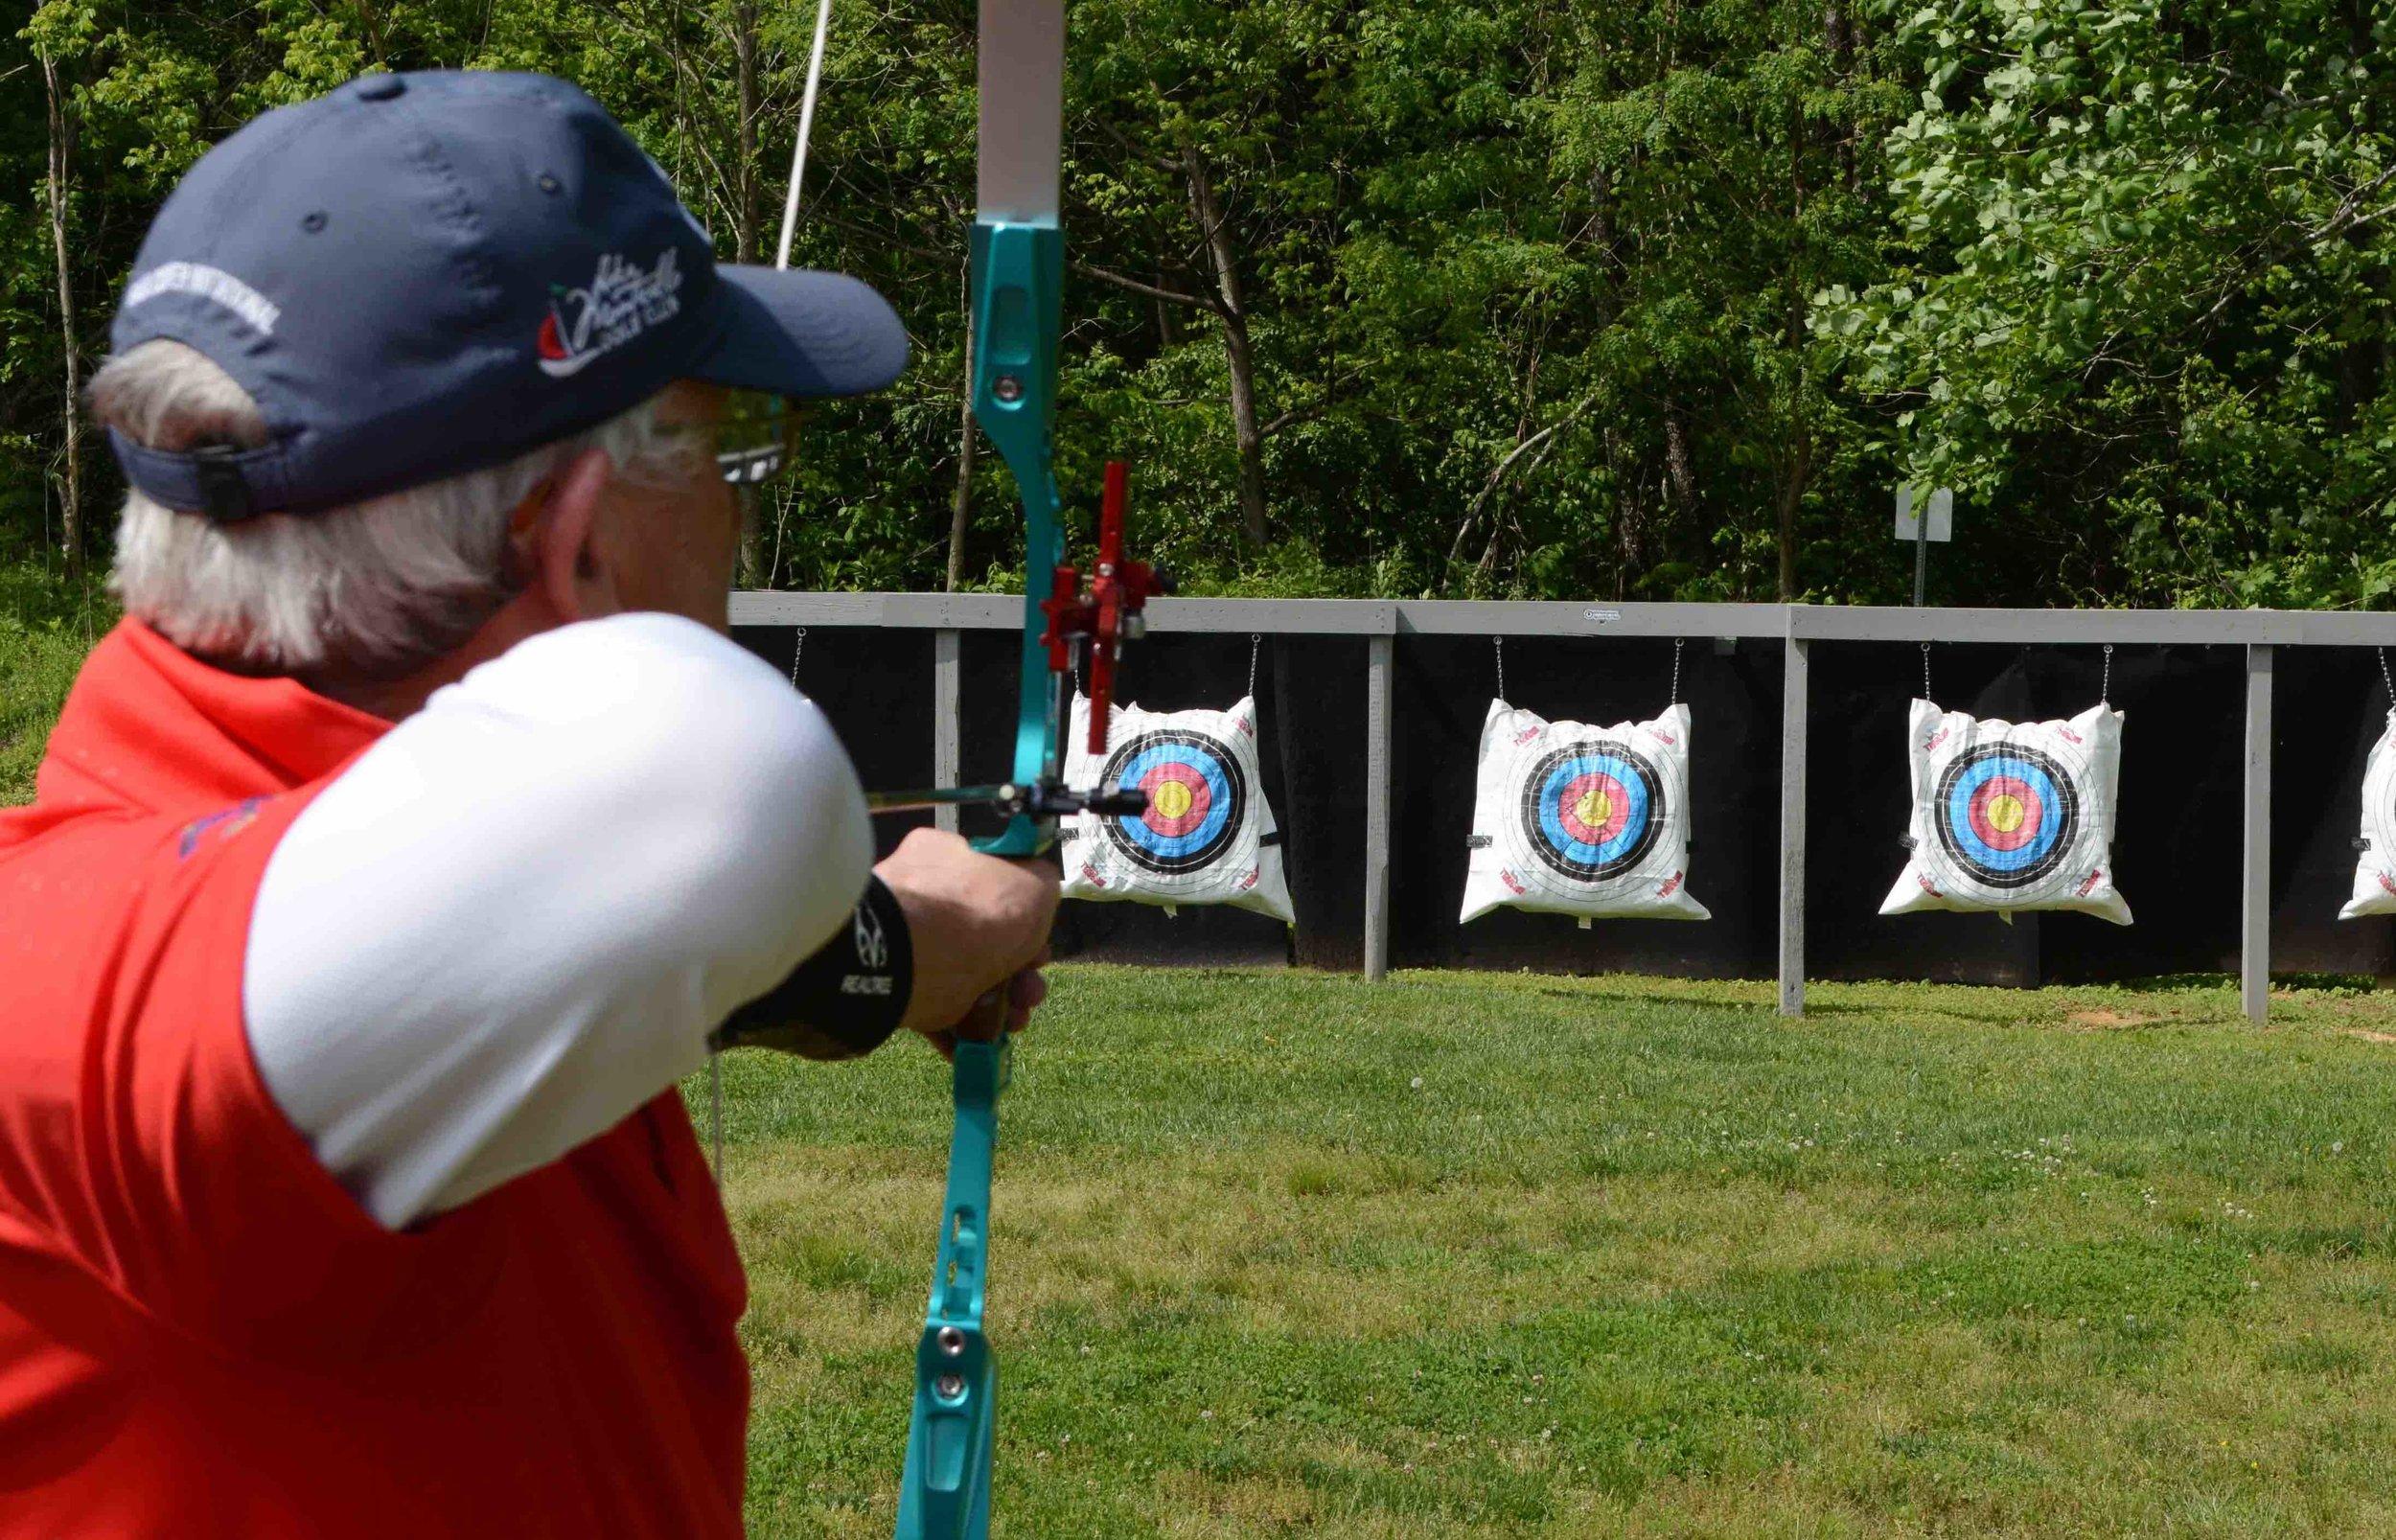 archery rodes farm may 2017 a1 copy.jpg